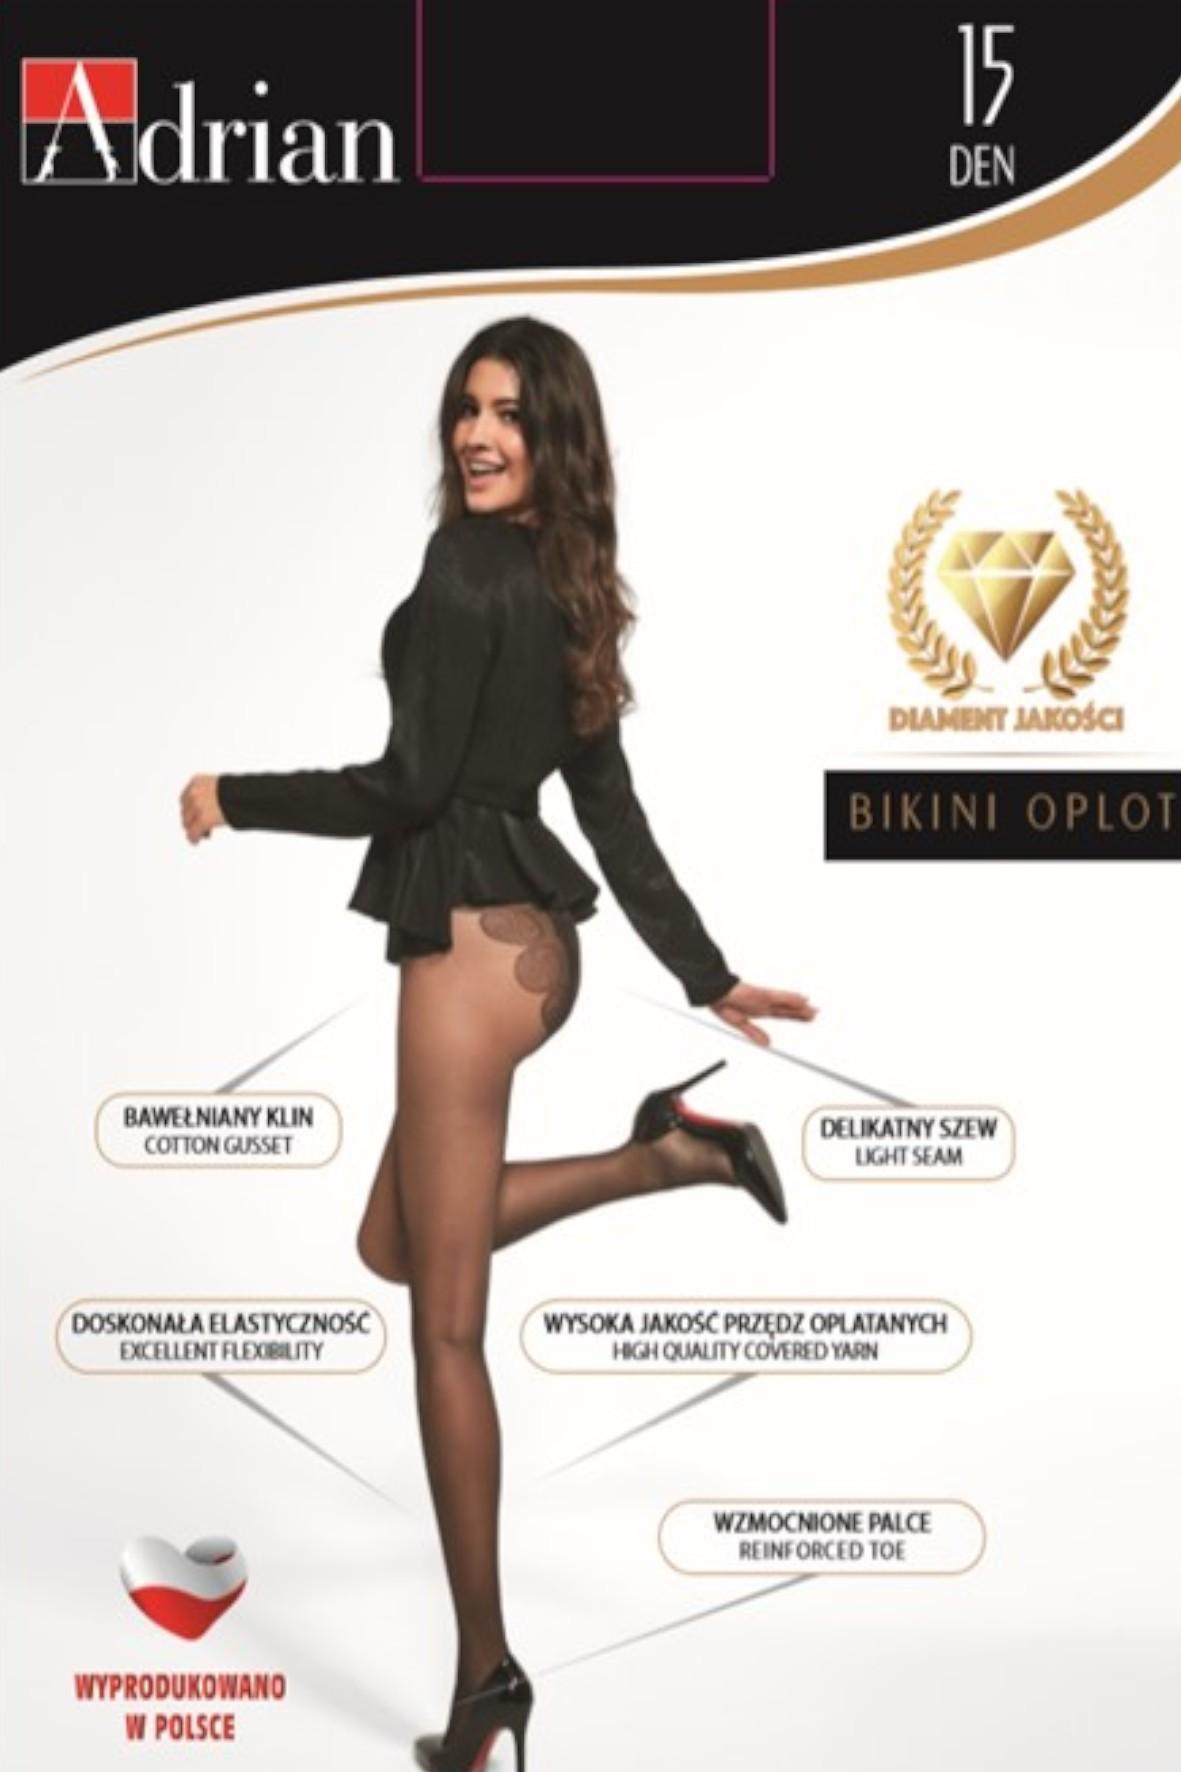 Rajstopy damskie Bikini 20 DEN - czarne